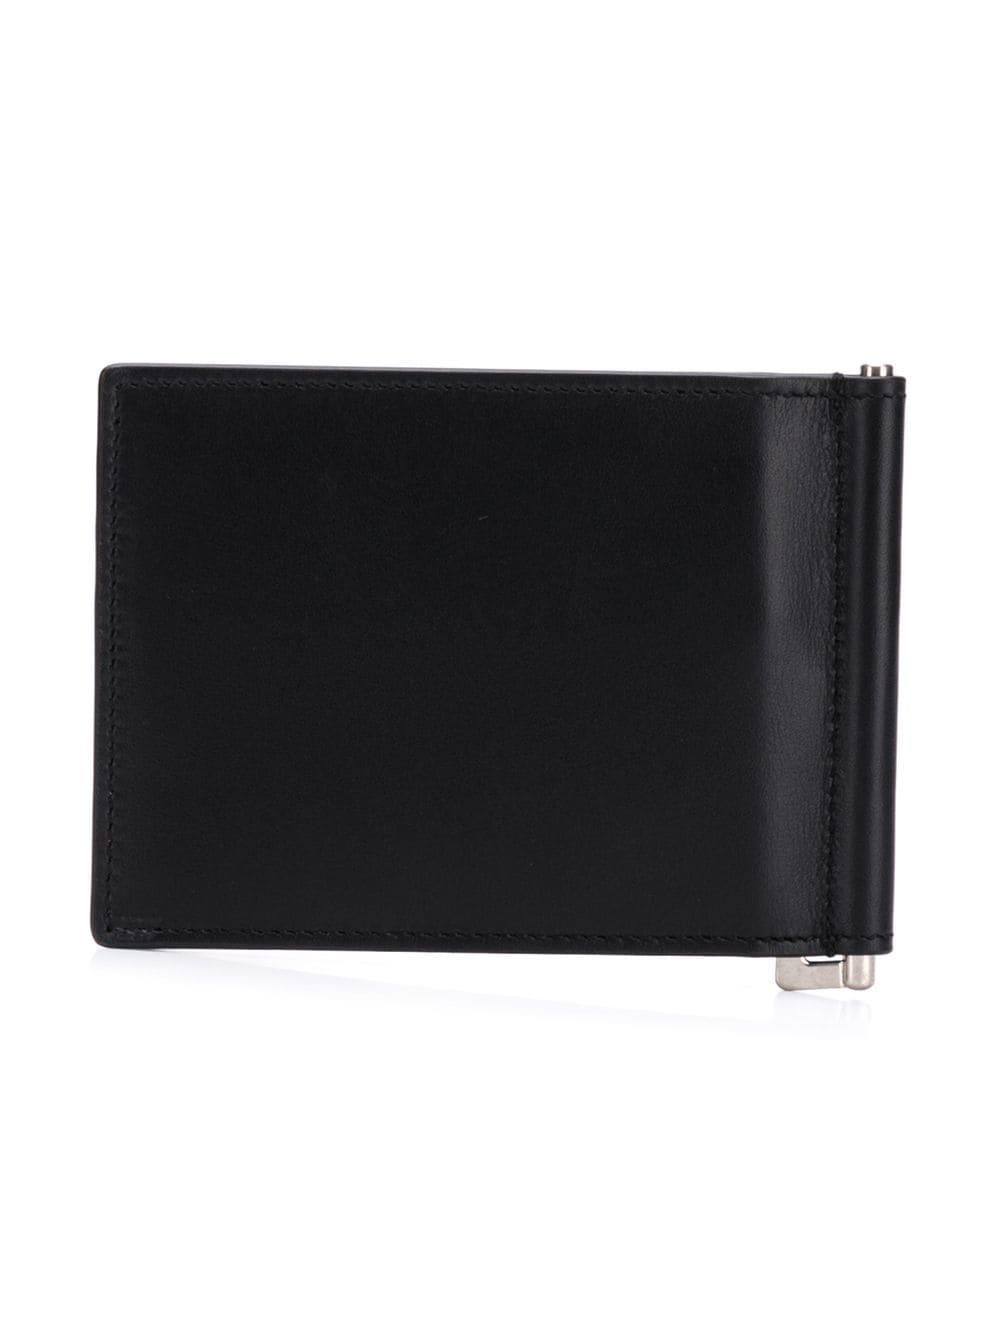 1cbf640b19 Lyst - Saint Laurent Id Bill Clip Wallet in Black for Men